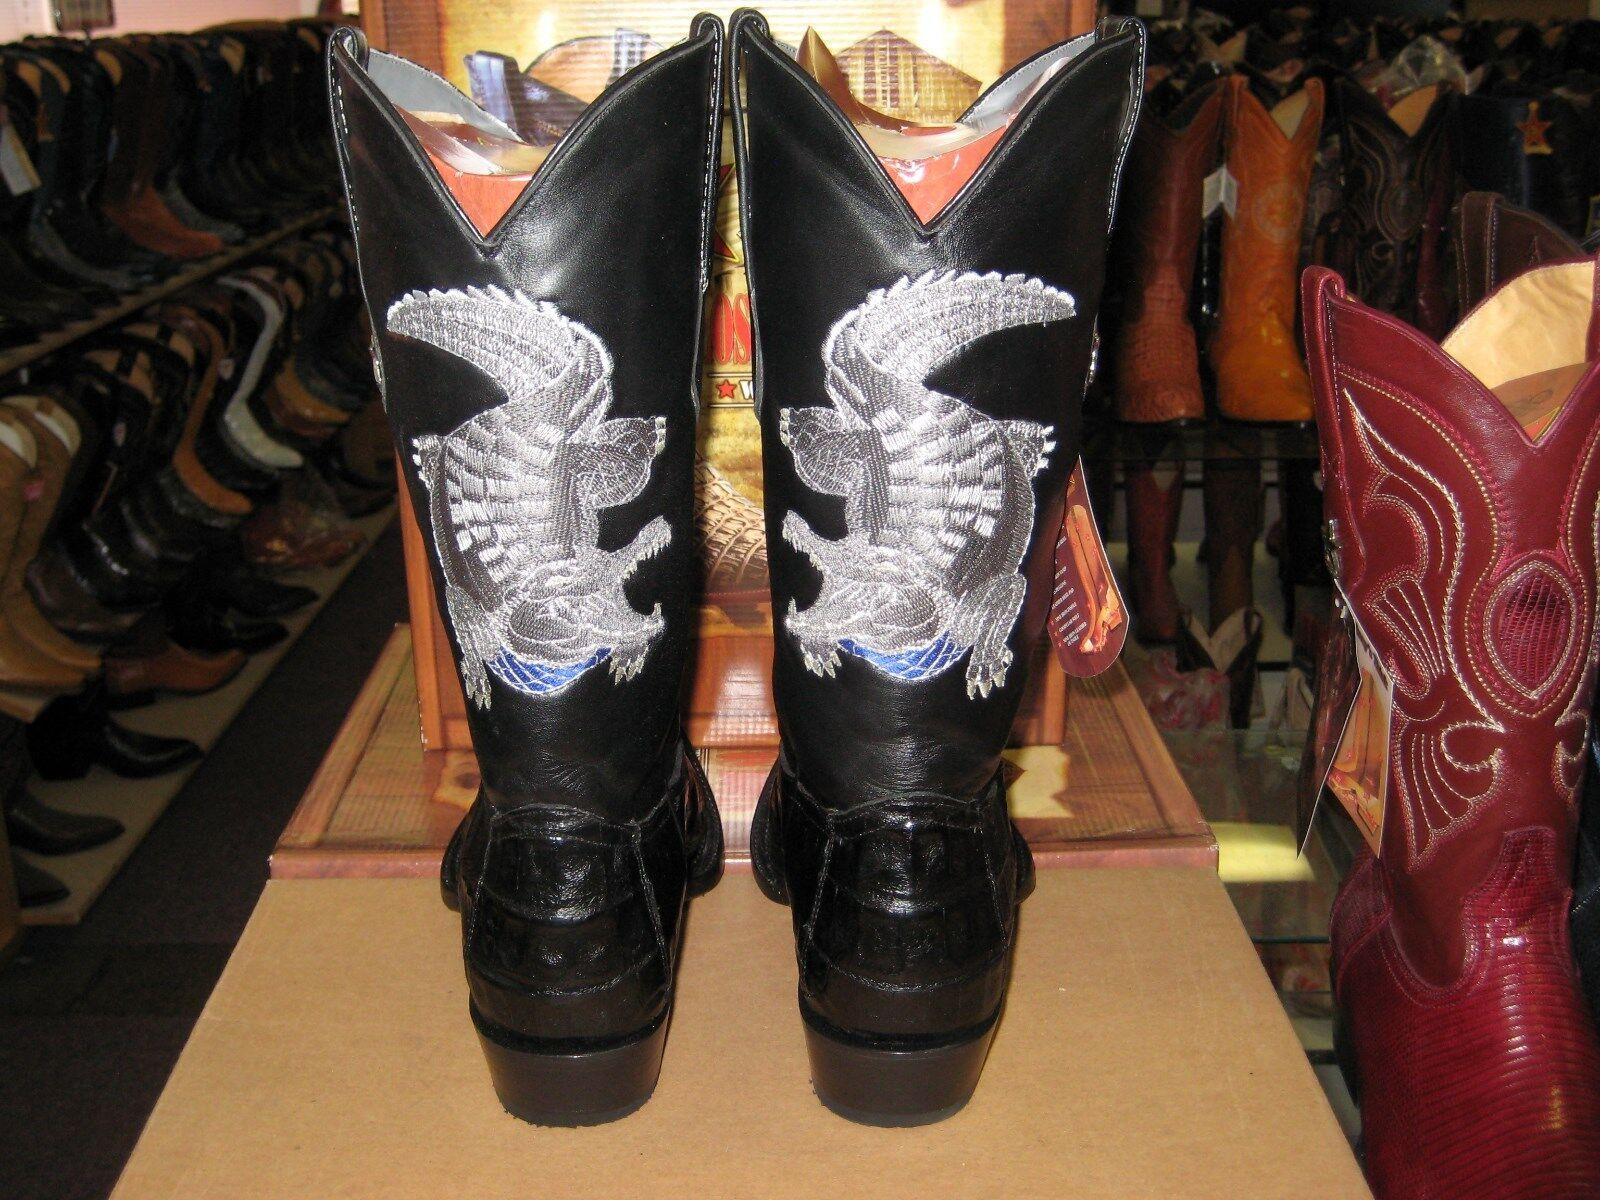 LOS ALTOS NEGRO SNIP Toe Monstruo Monstruo Monstruo Cocodrilo cola Bota de vaquero occidental (extra grande) 98E0105 c13c96